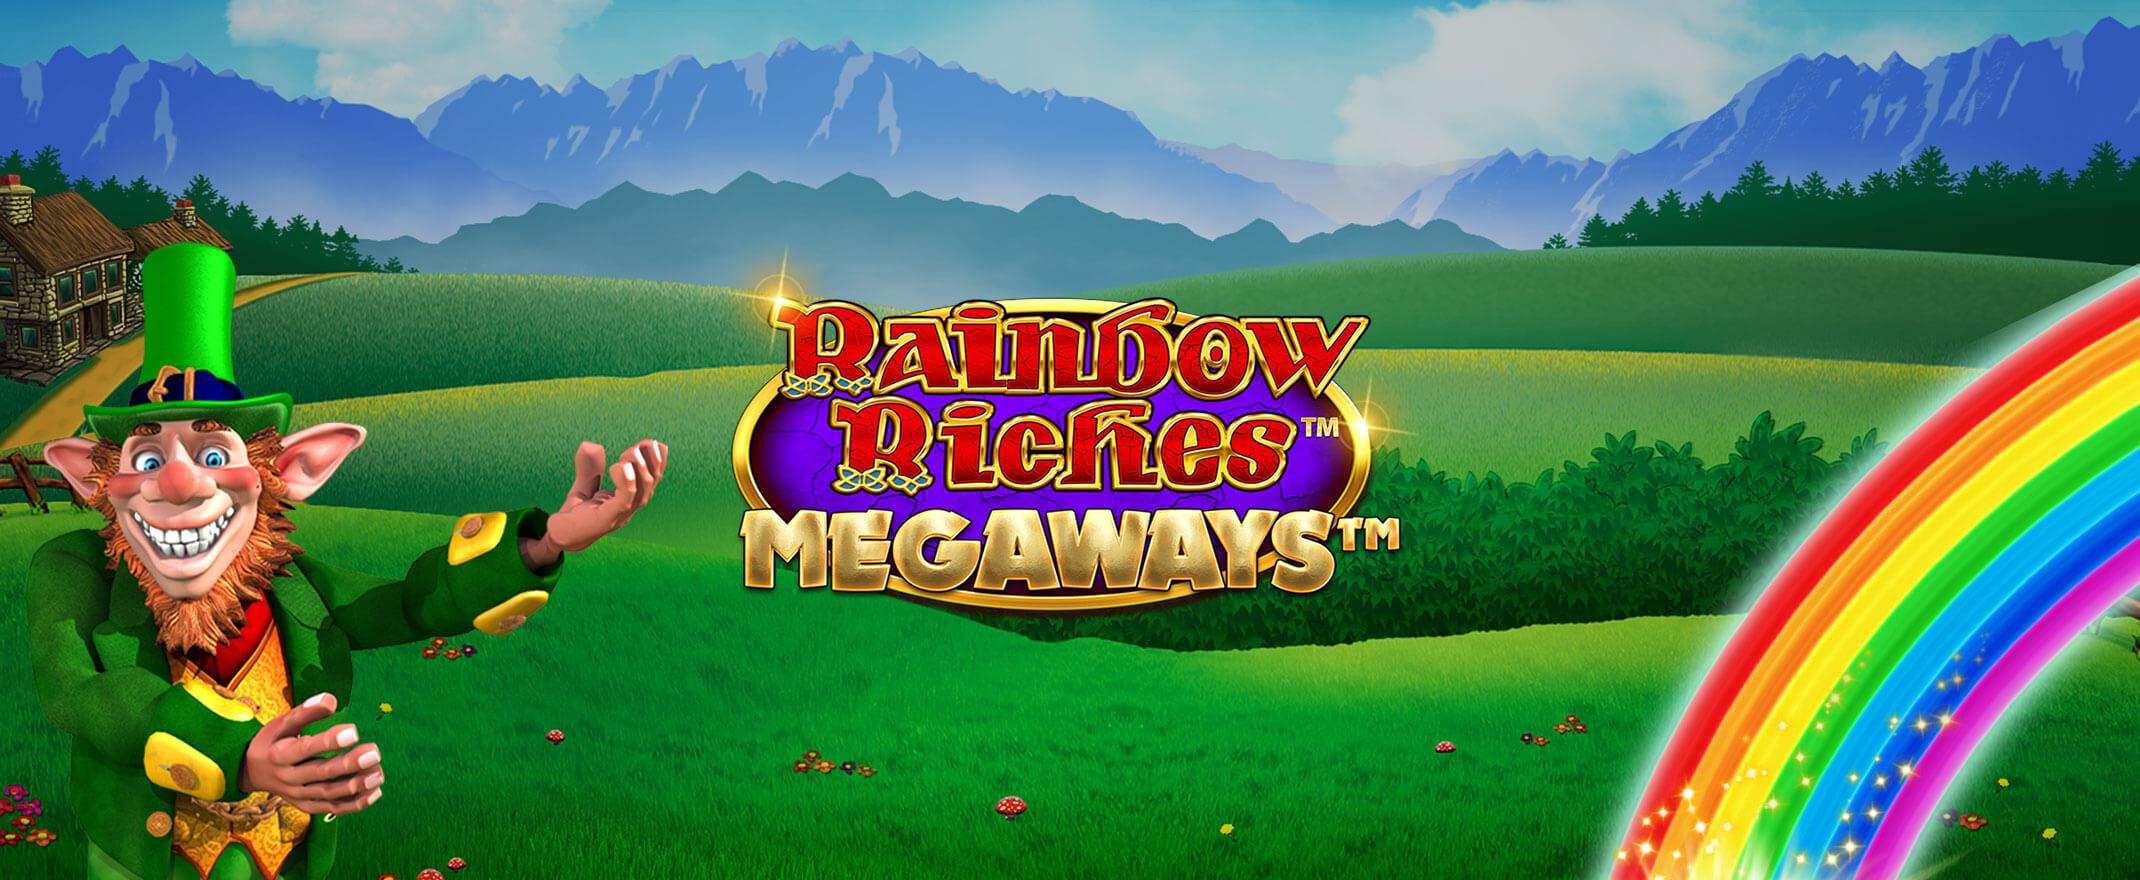 New, Rainbow Riches Megaways